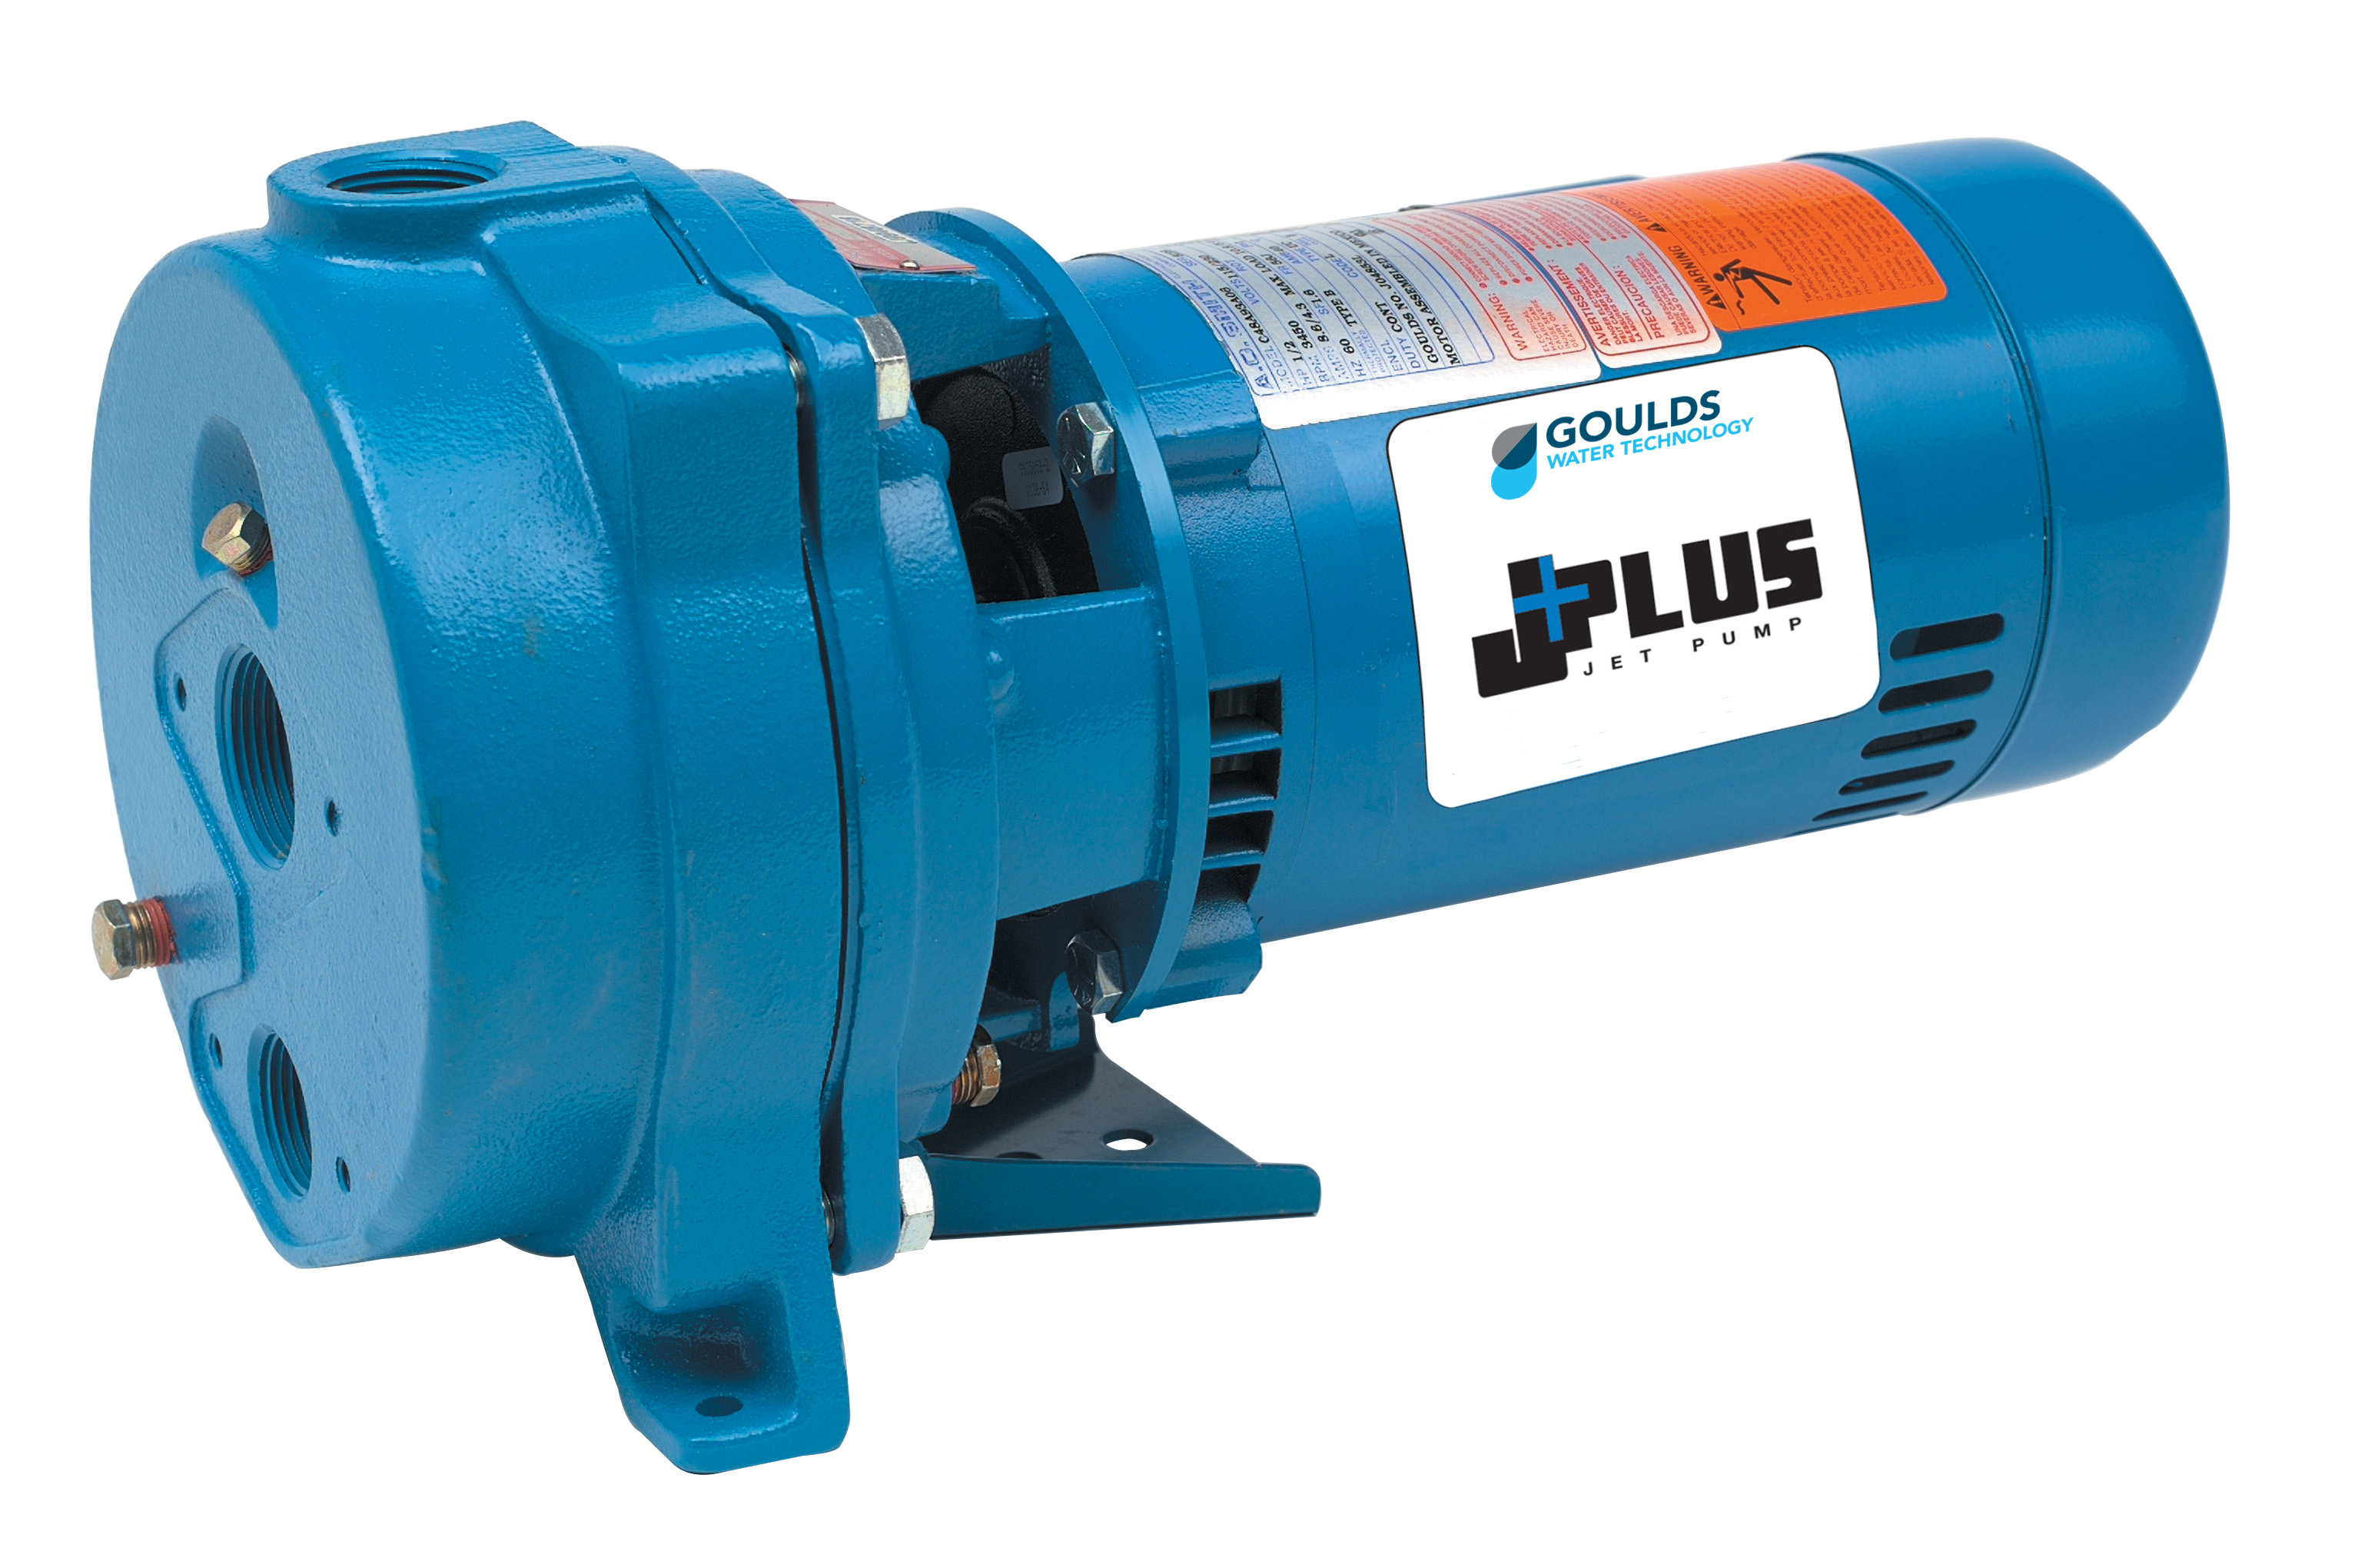 Goulds J10 1 Hp Deep Well Jet Pump Partridge Well Drilling